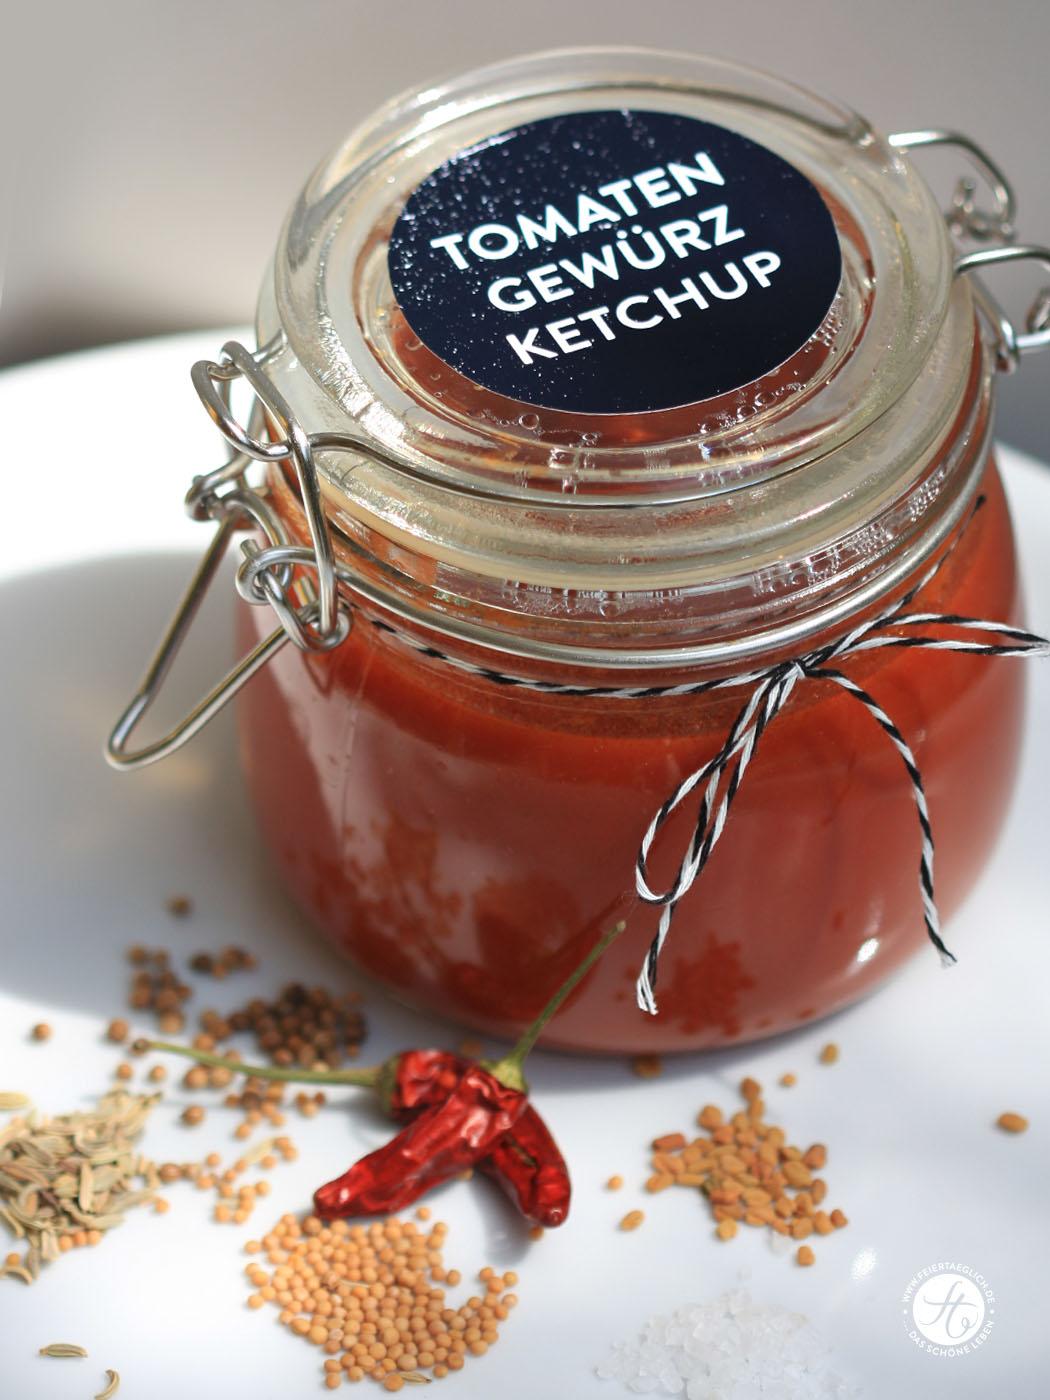 tomatengewuerzketchup_h1